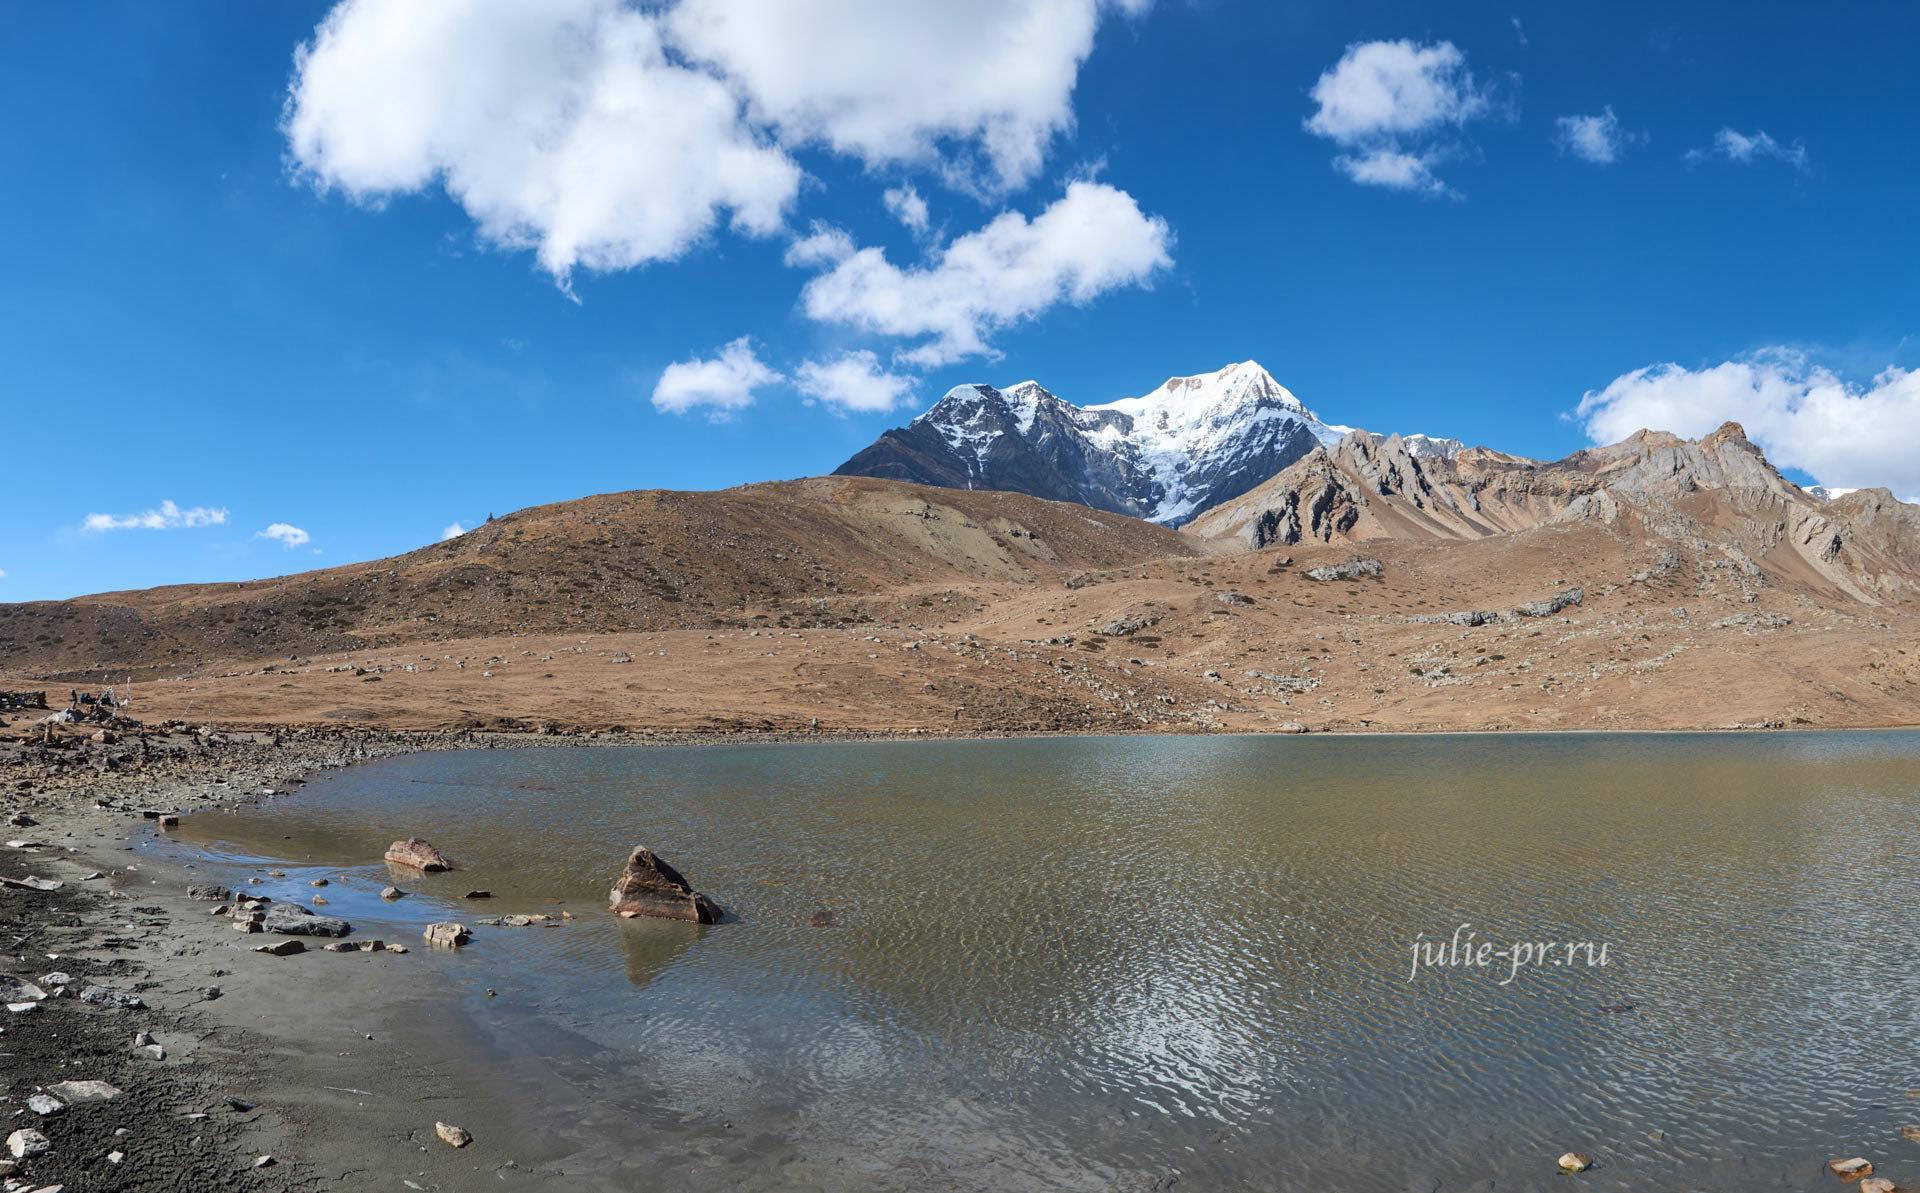 Непал, Трек вокруг Аннапурны, Ice Lake, Ледяное озеро